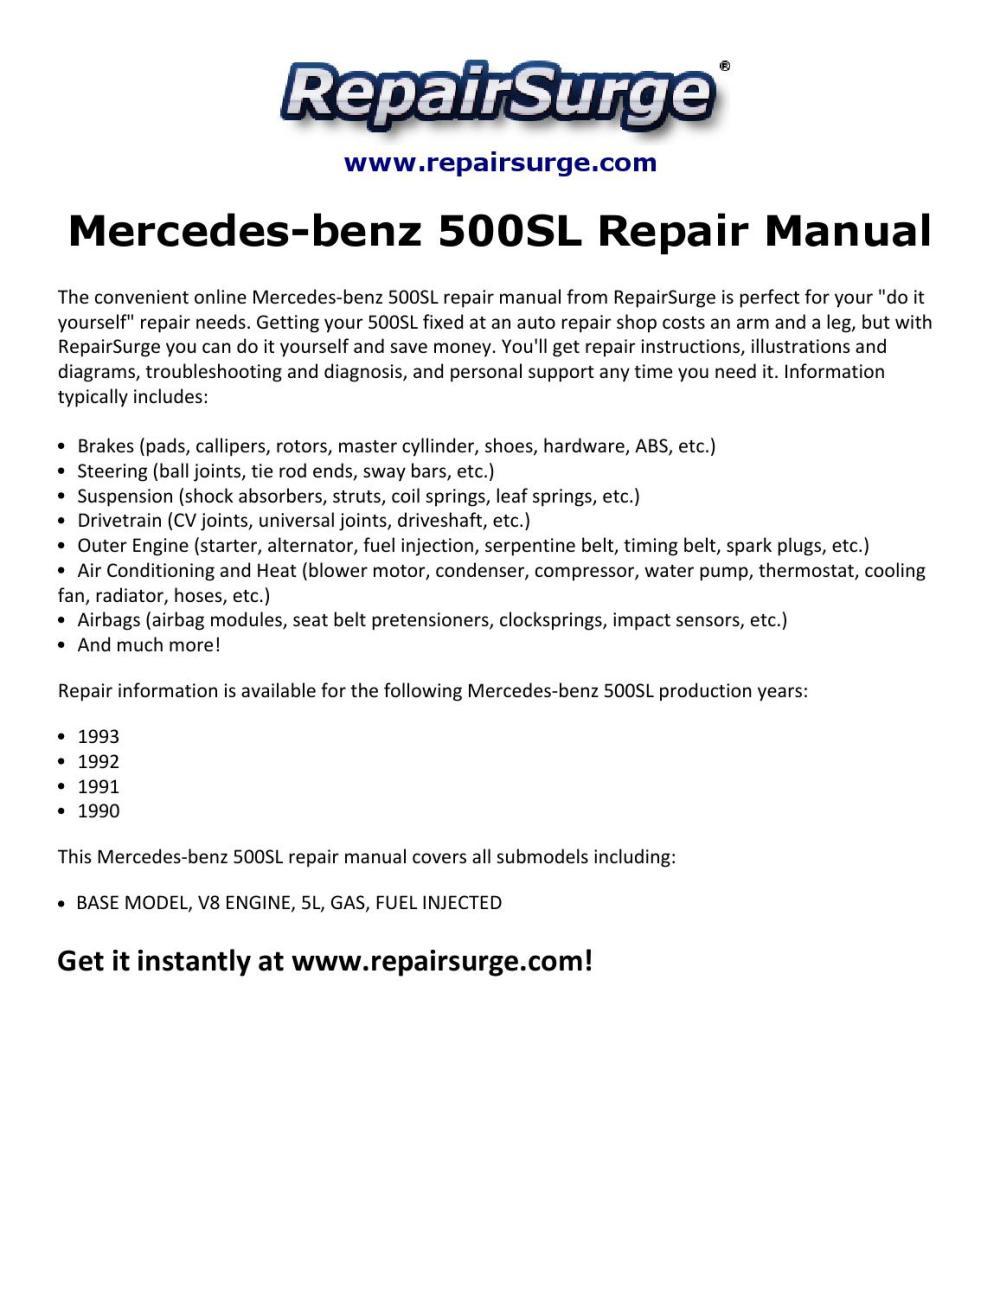 medium resolution of mercedes benz 500sl repair manual 1990 1993 by michael jatenson issuu 1991 mercedes benz sl500 1991 mercedes 500sl engine diagrams